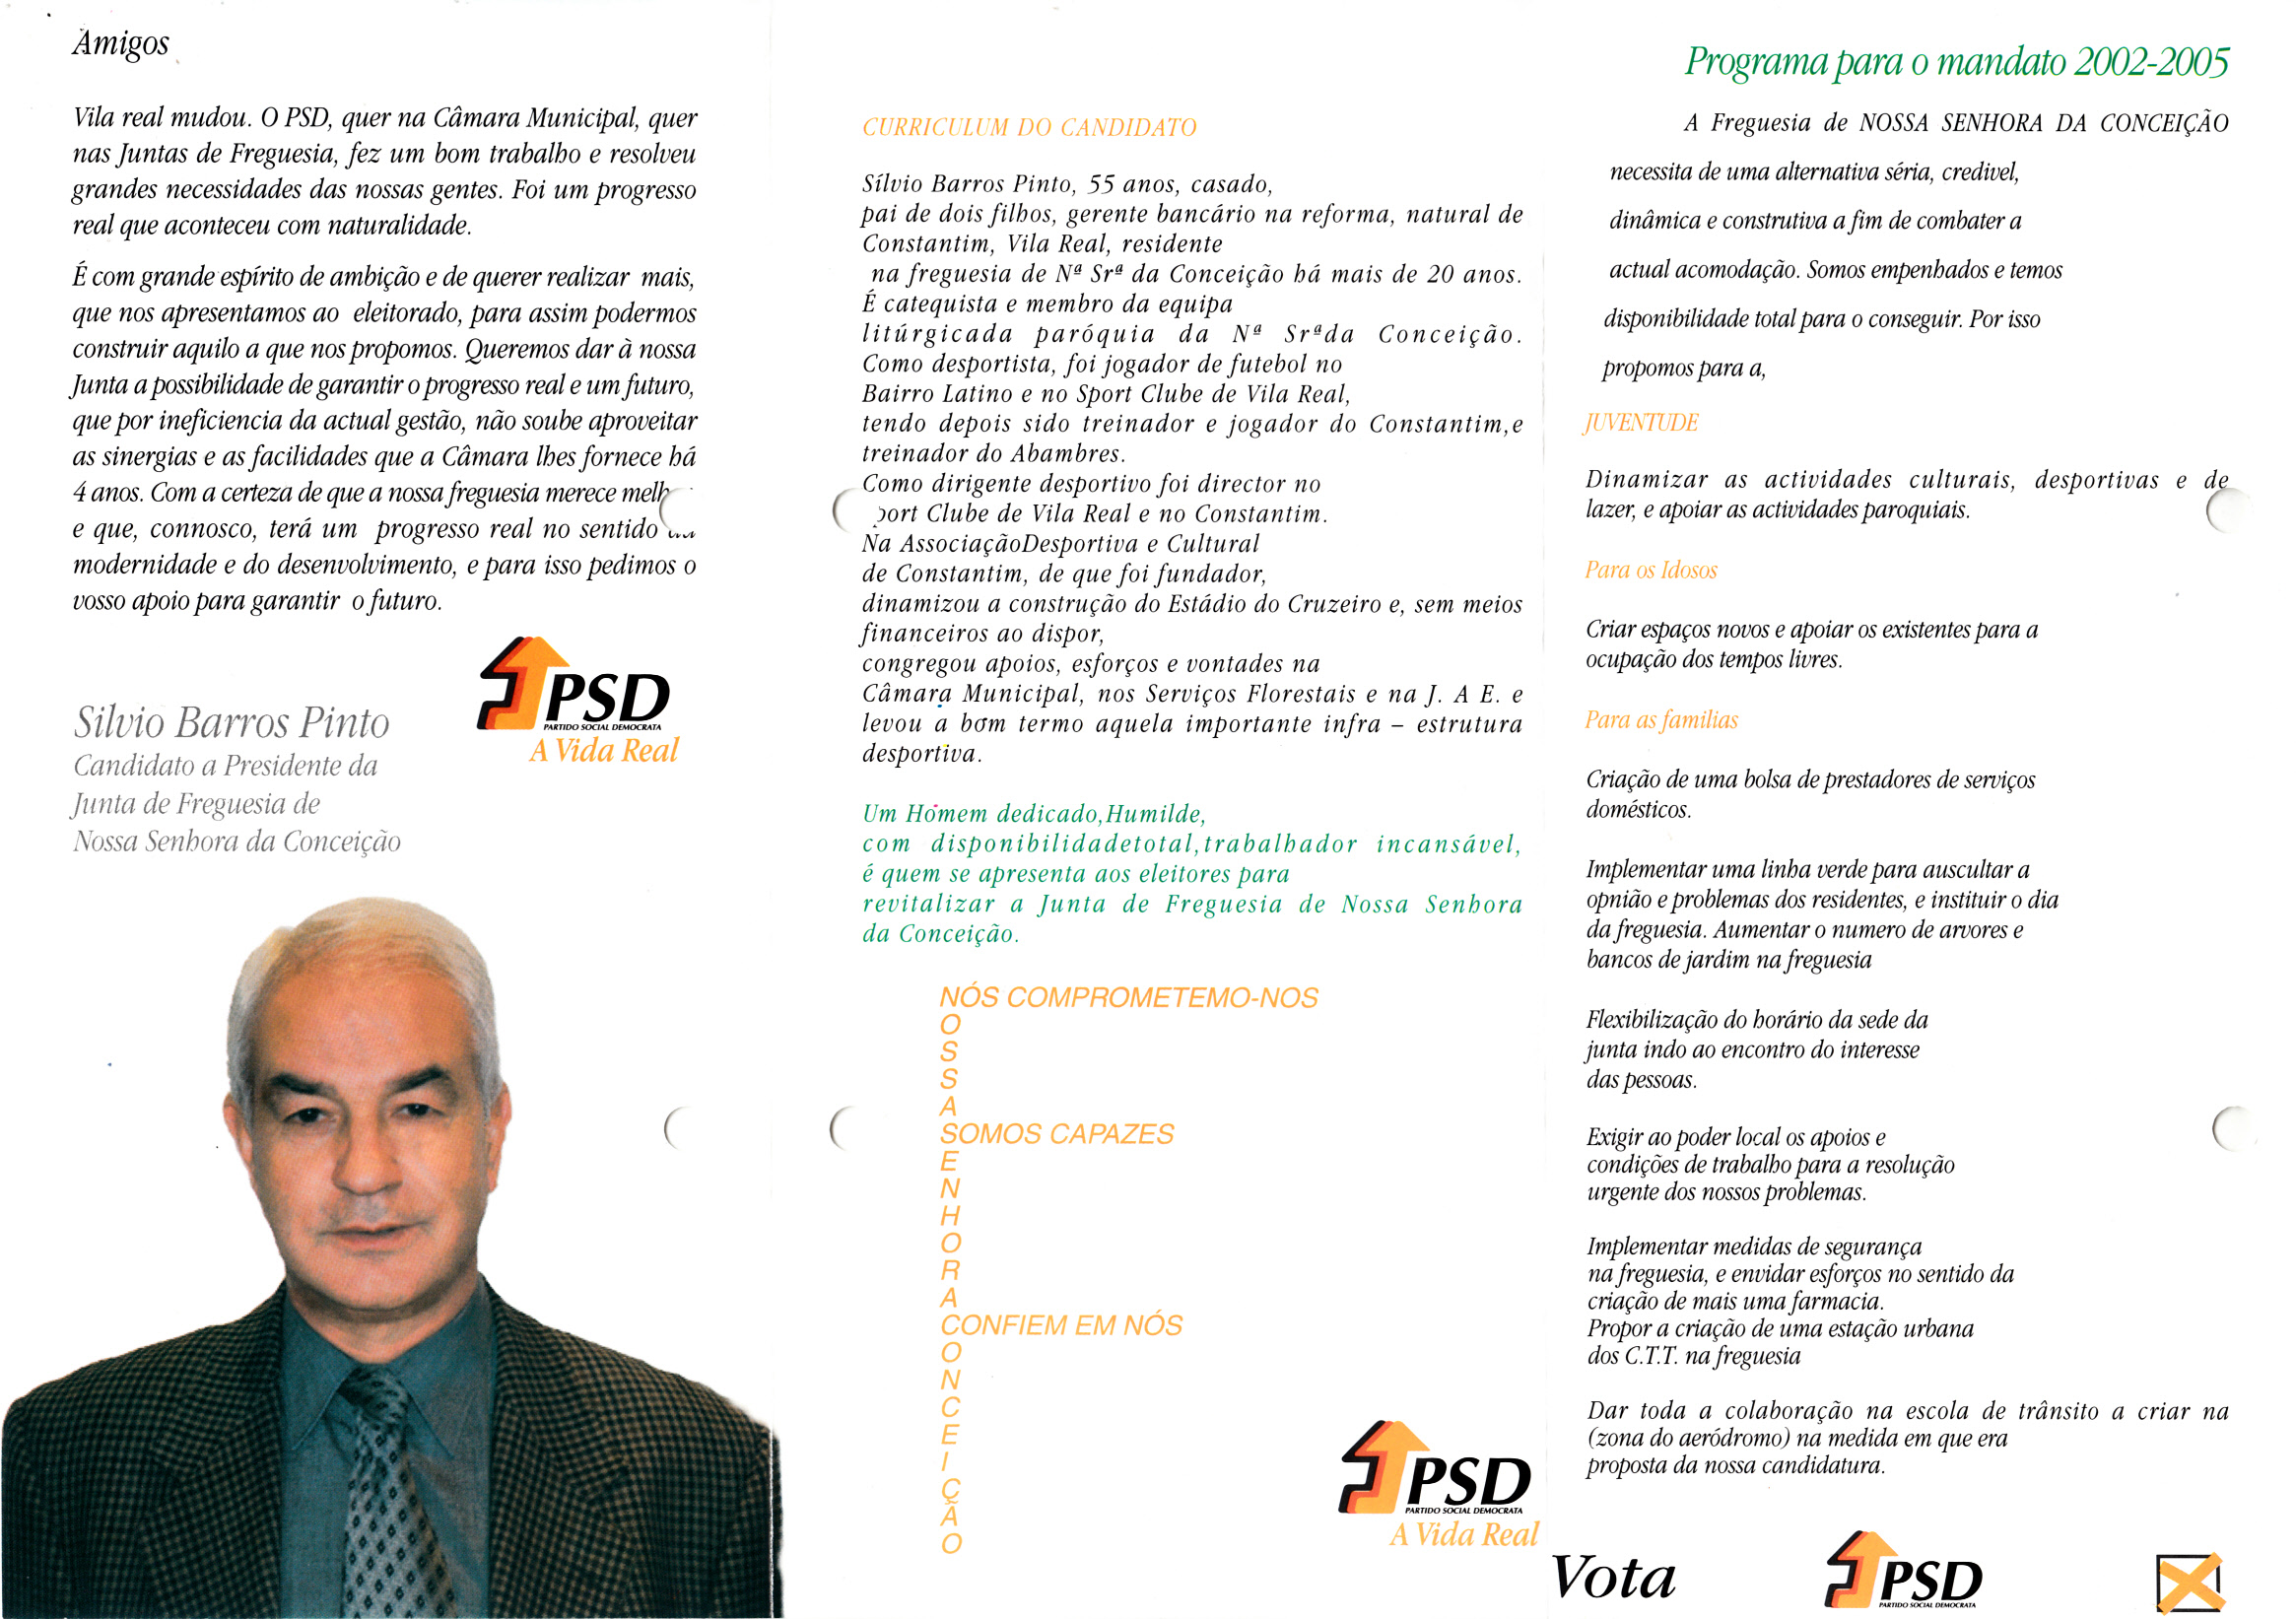 PSD_2001-VILA REAL_CONCEICAO_0002